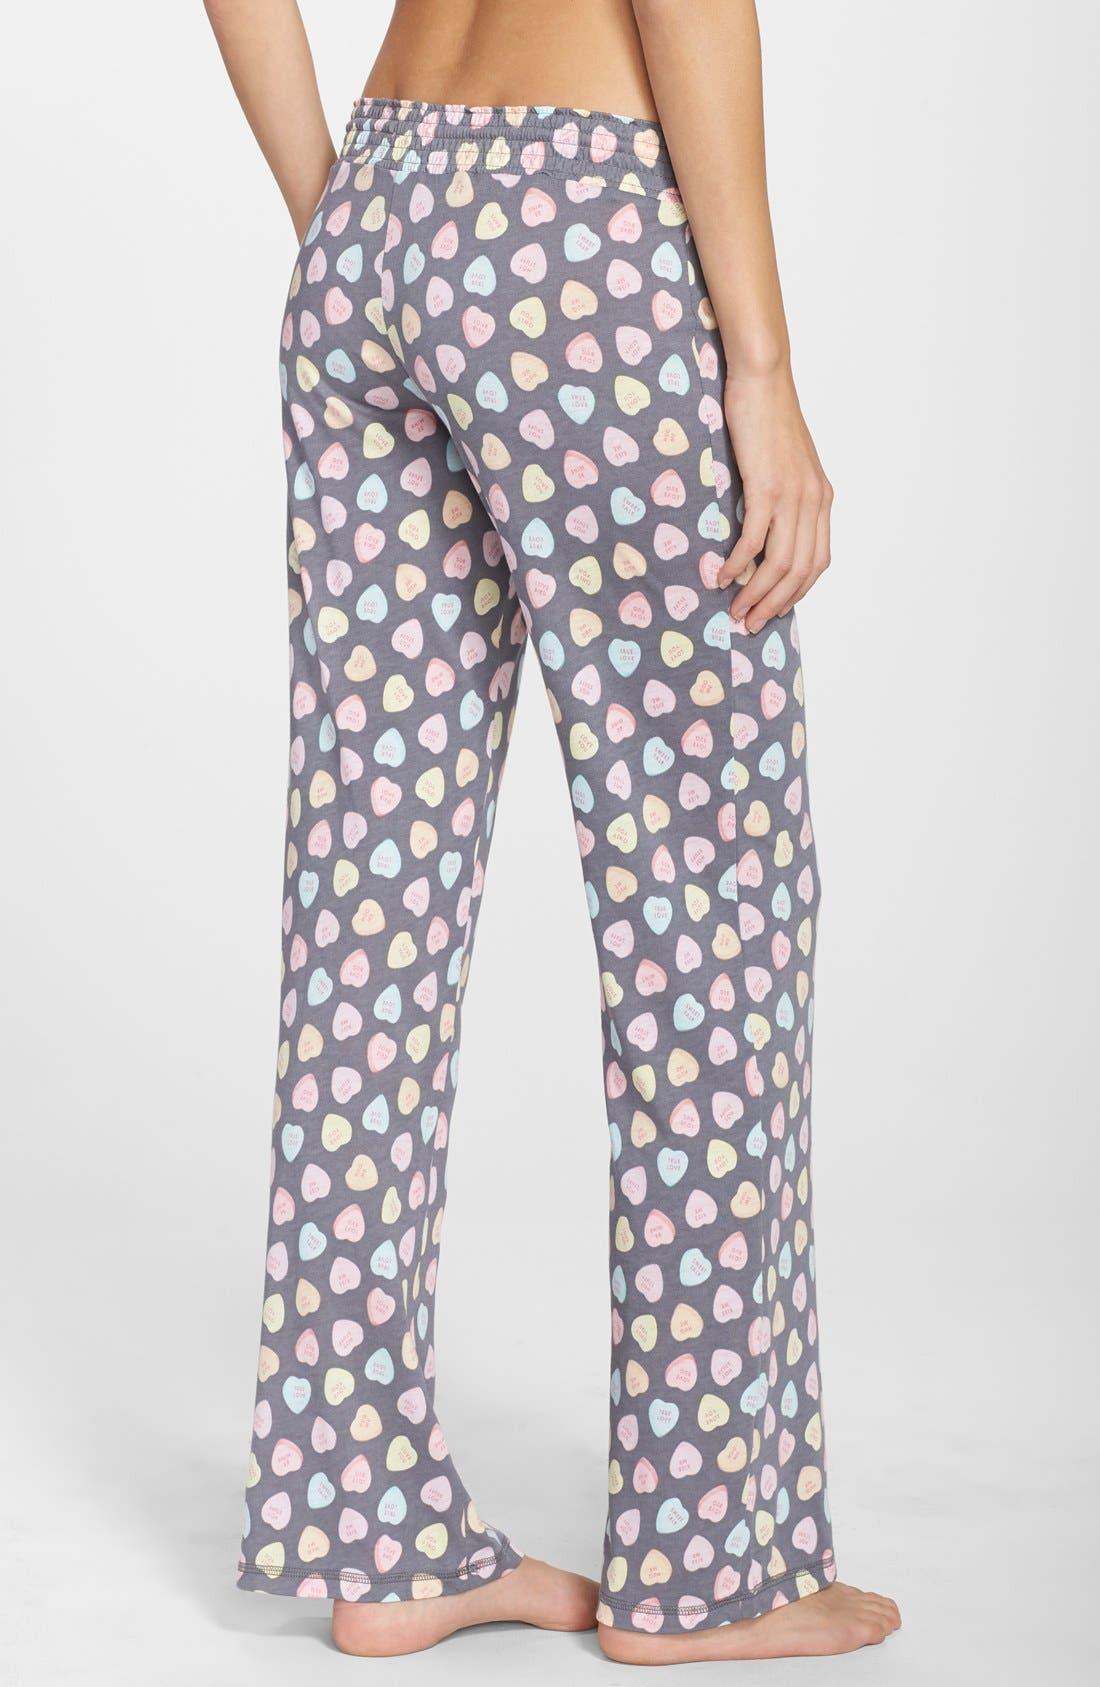 PJ SALVAGE,                             'Candy Hearts' Pajama Pants,                             Alternate thumbnail 3, color,                             020